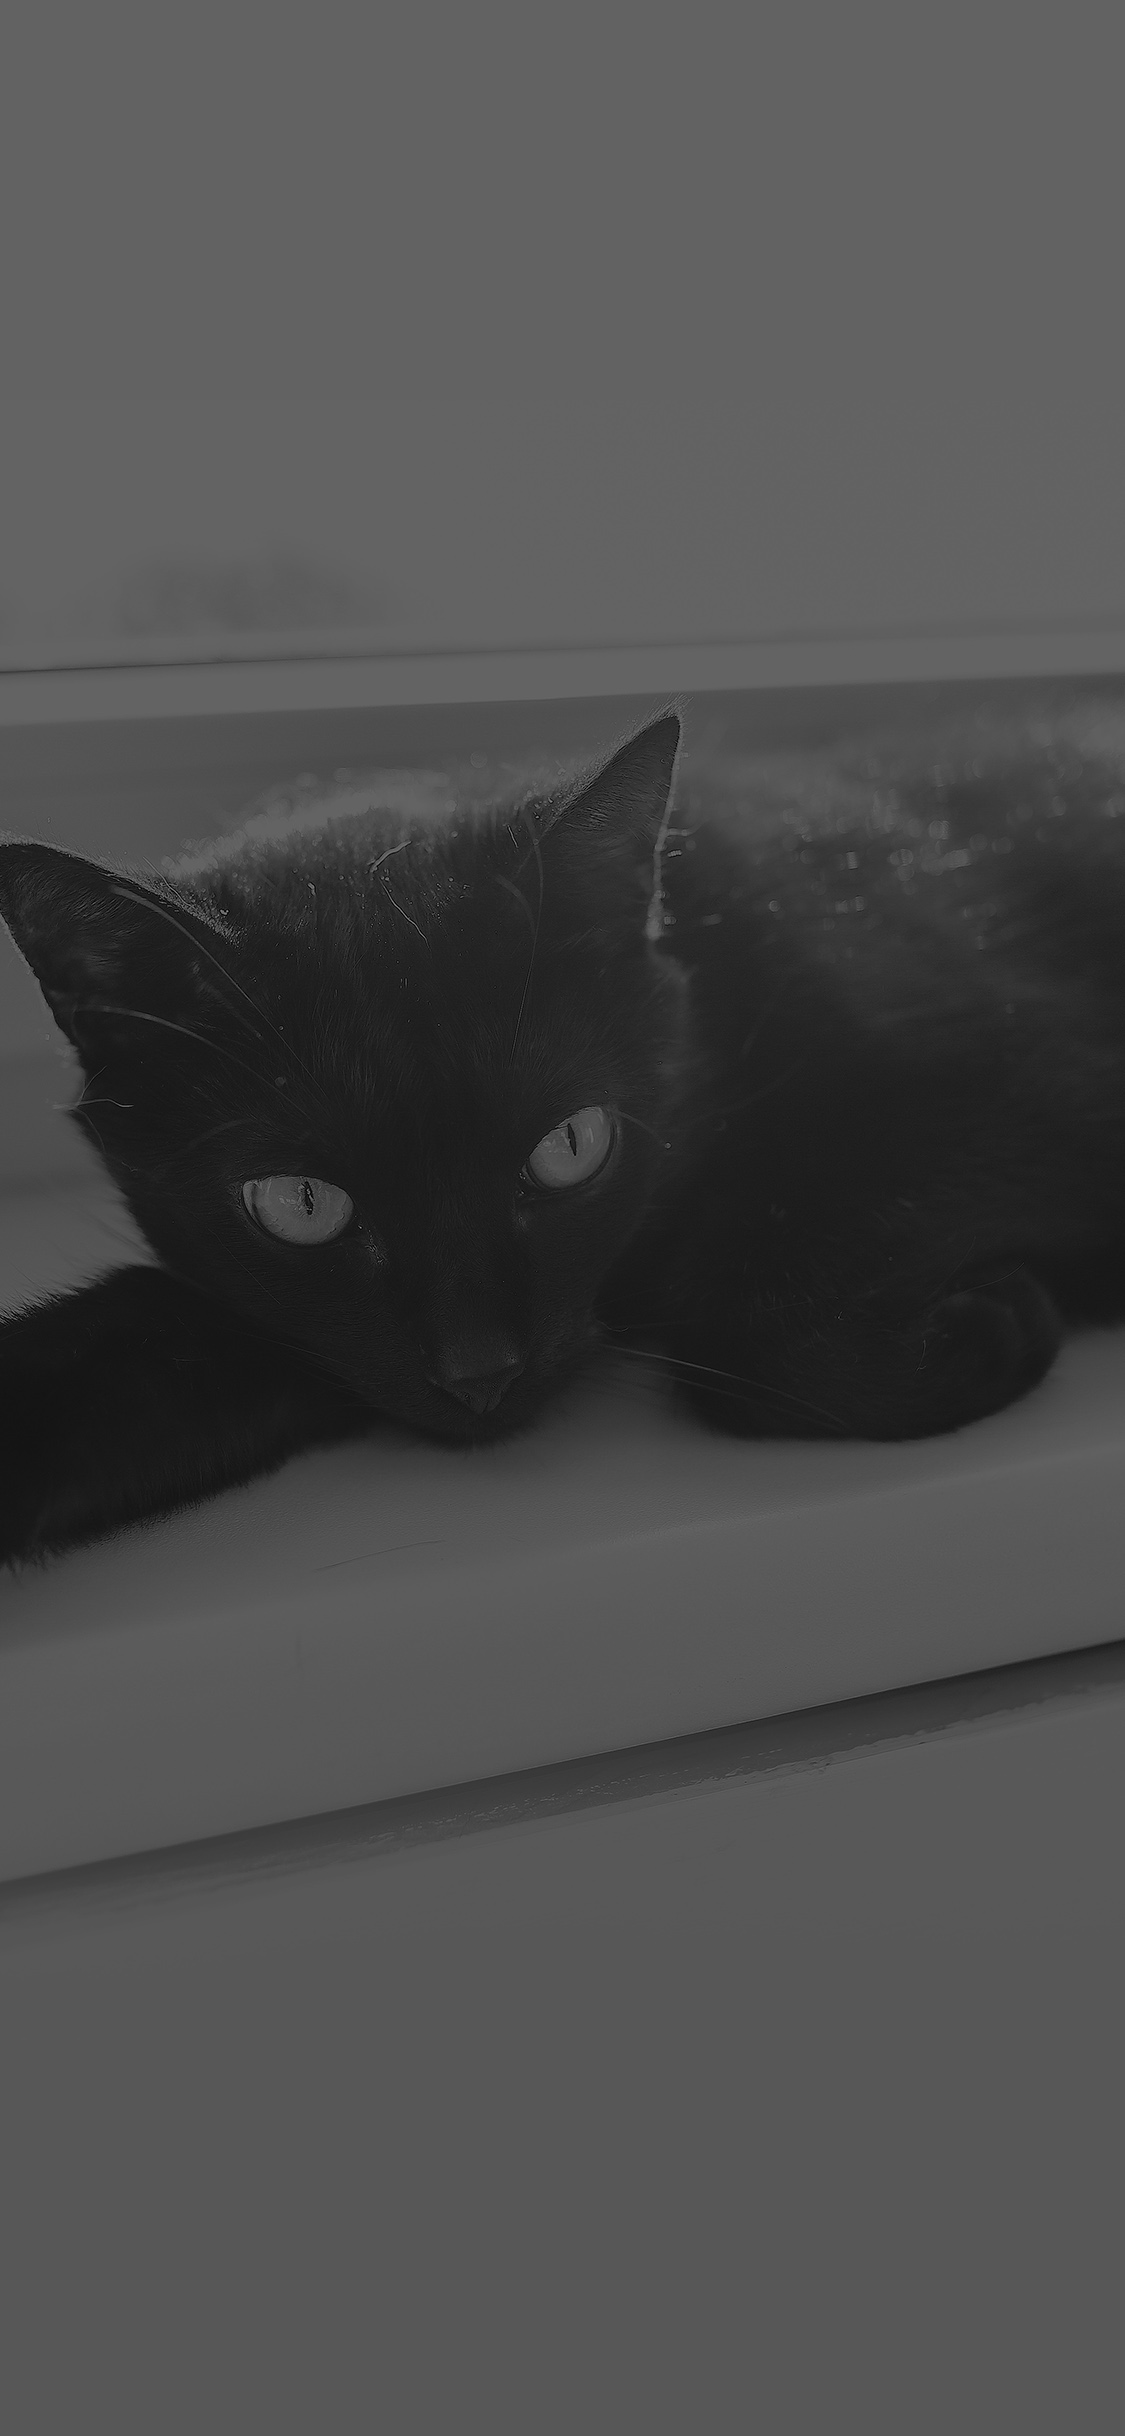 iPhoneXpapers.com-Apple-iPhone-wallpaper-mv33-black-cat-animal-cute-watching-dark-bw